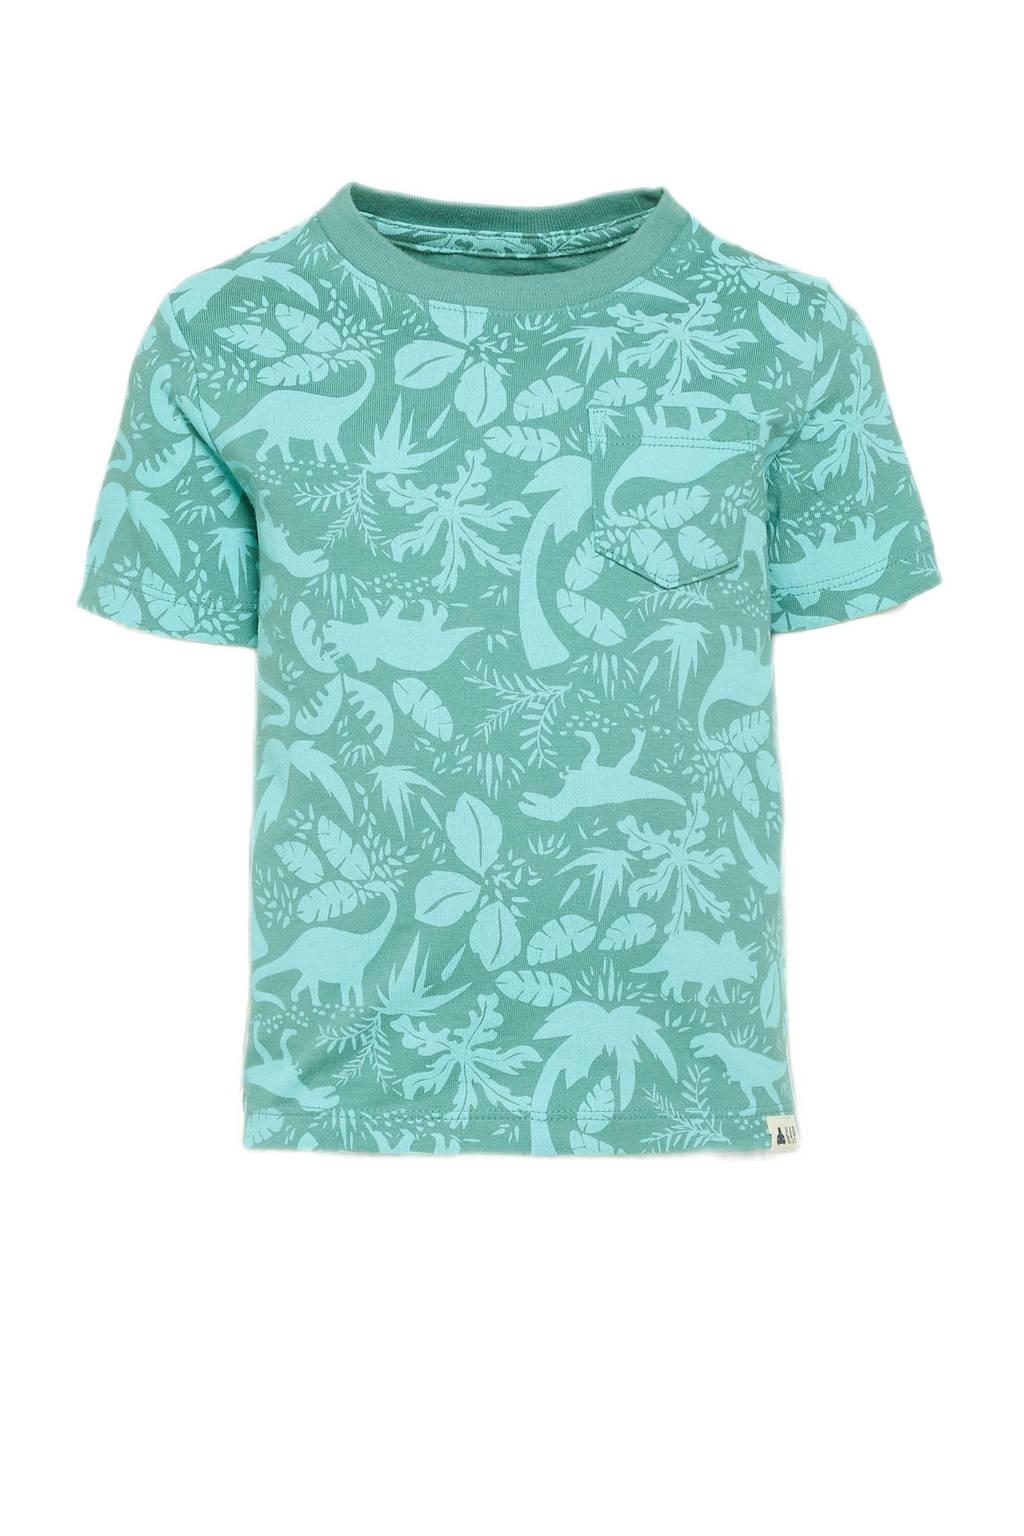 GAP T-shirt met all over print groen, Groen